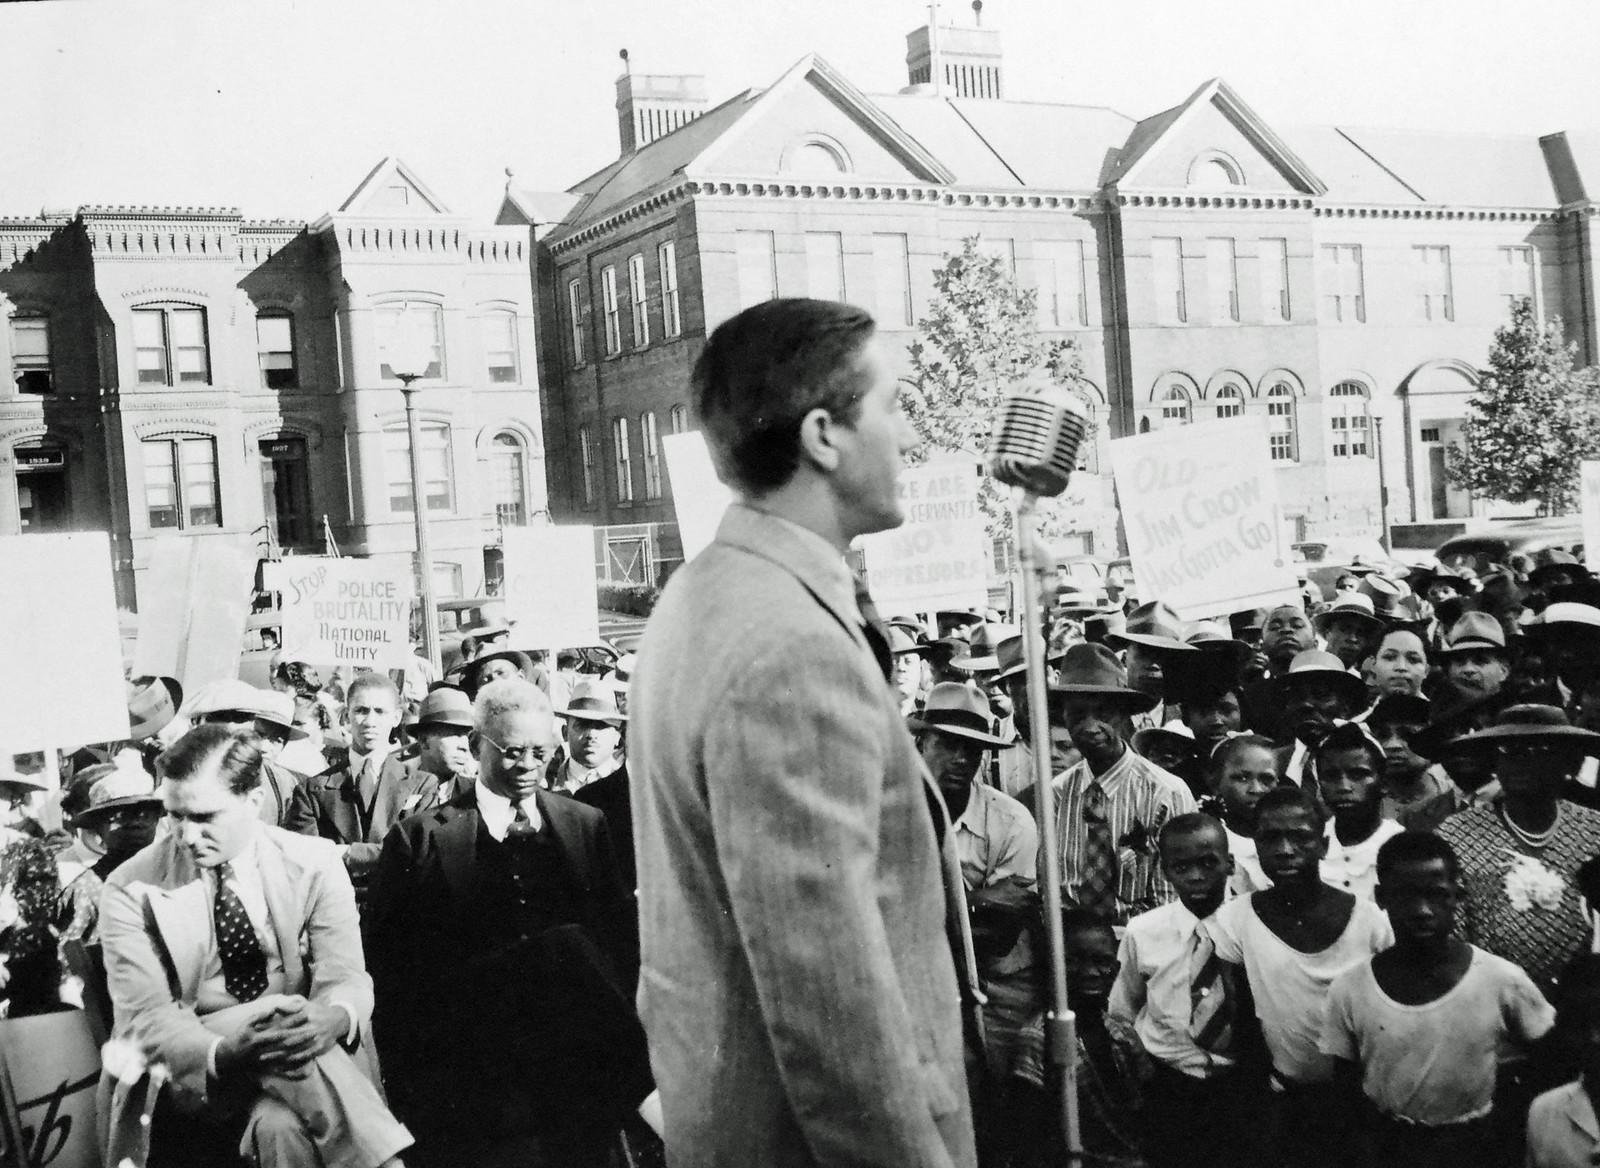 CIO Union Speaks Against DC Police Brutality: 1941